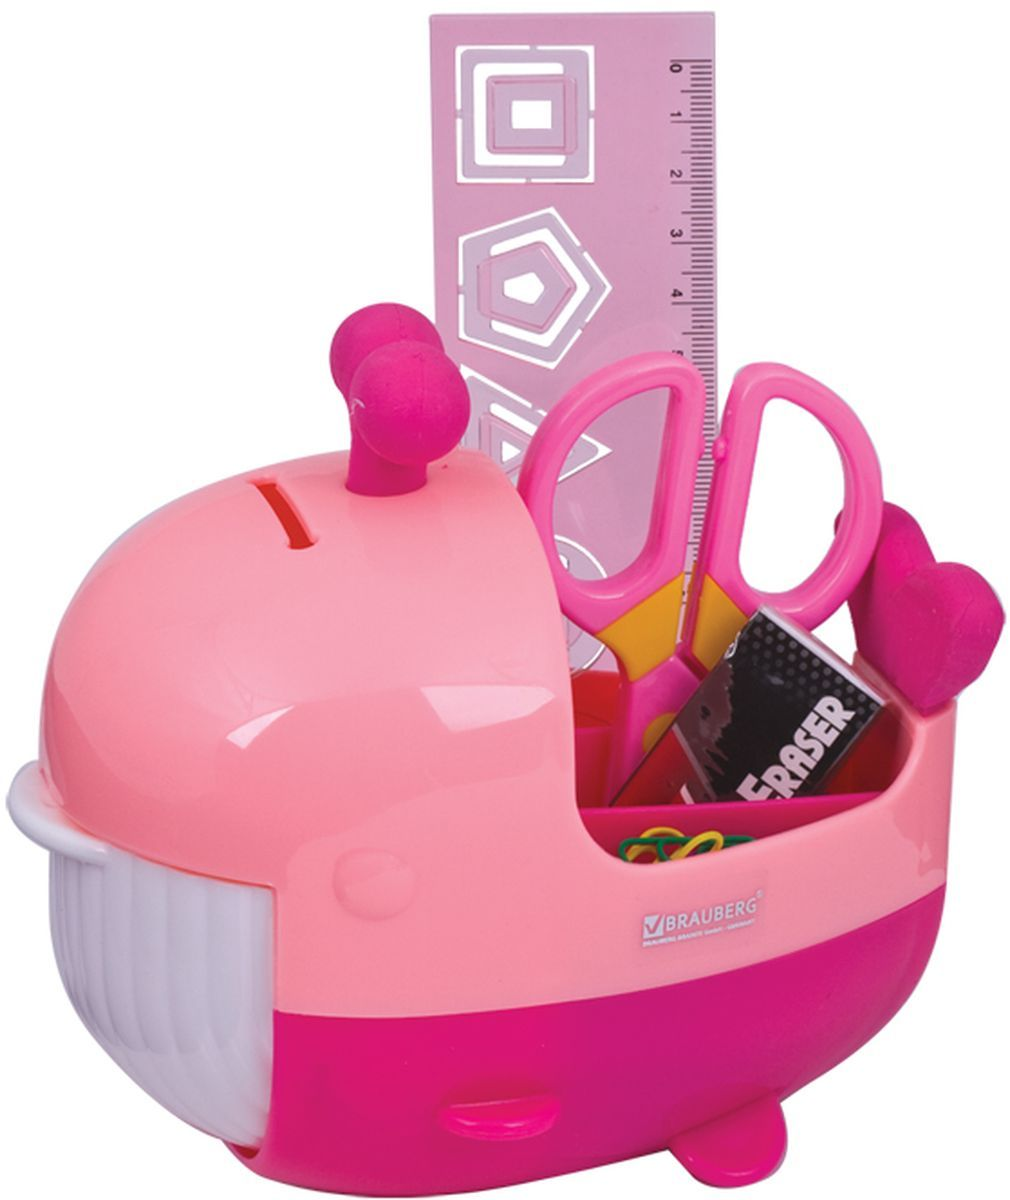 Brauberg Канцелярский набор Кит цвет розовый 4 предмета